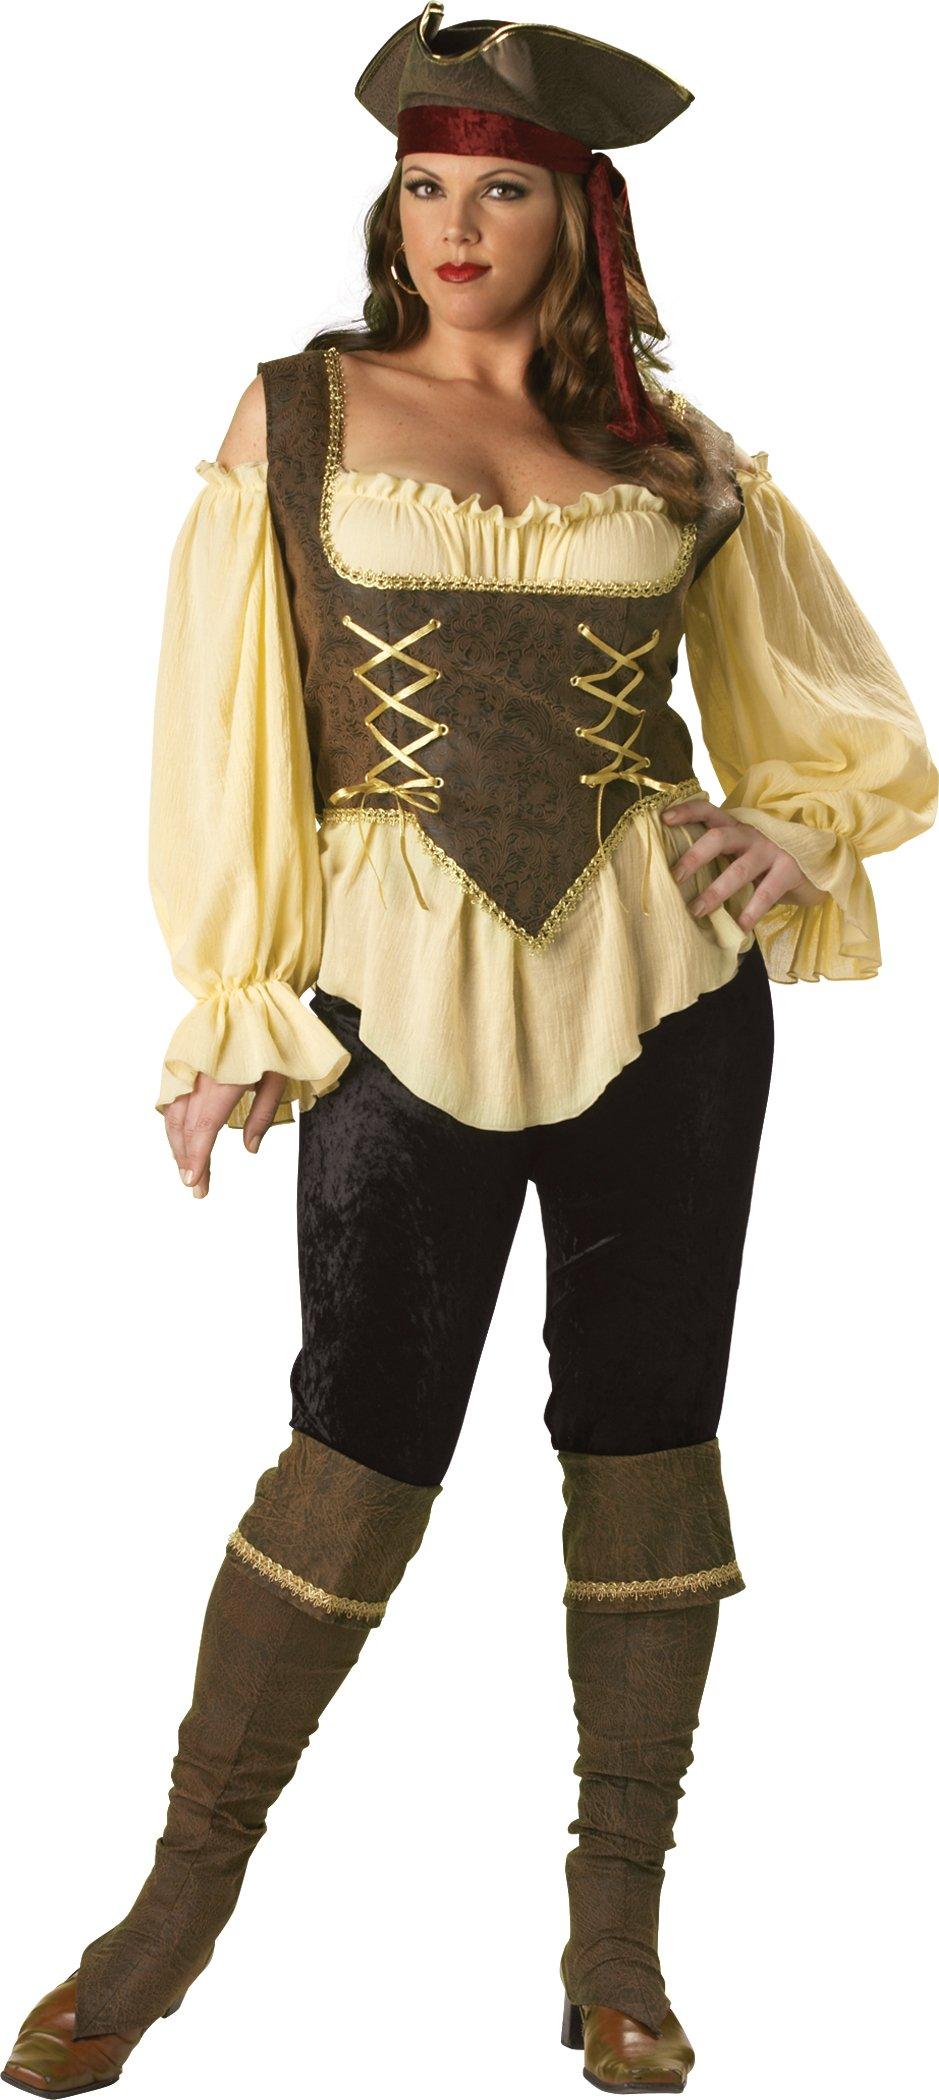 InCharacter Women's Rustic Pirate Lady Costume - 2X - Tan/Brown